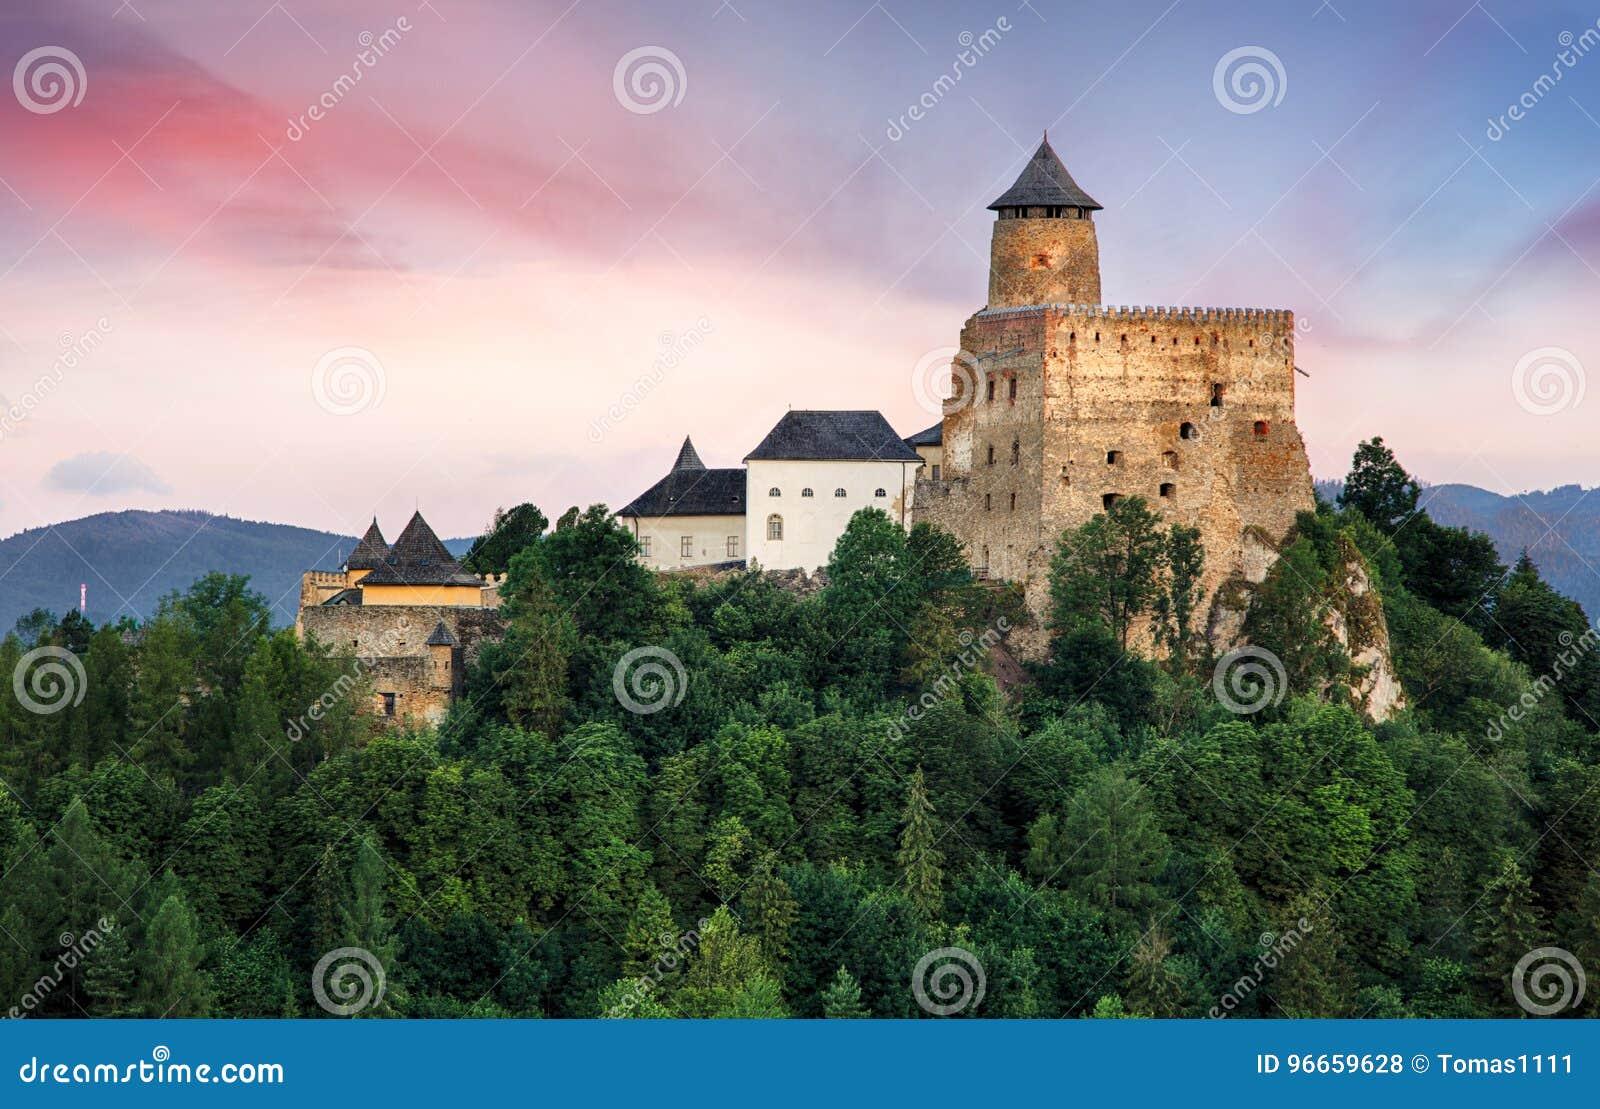 Stara Lubovna castle in Slovakia, Europe landmark